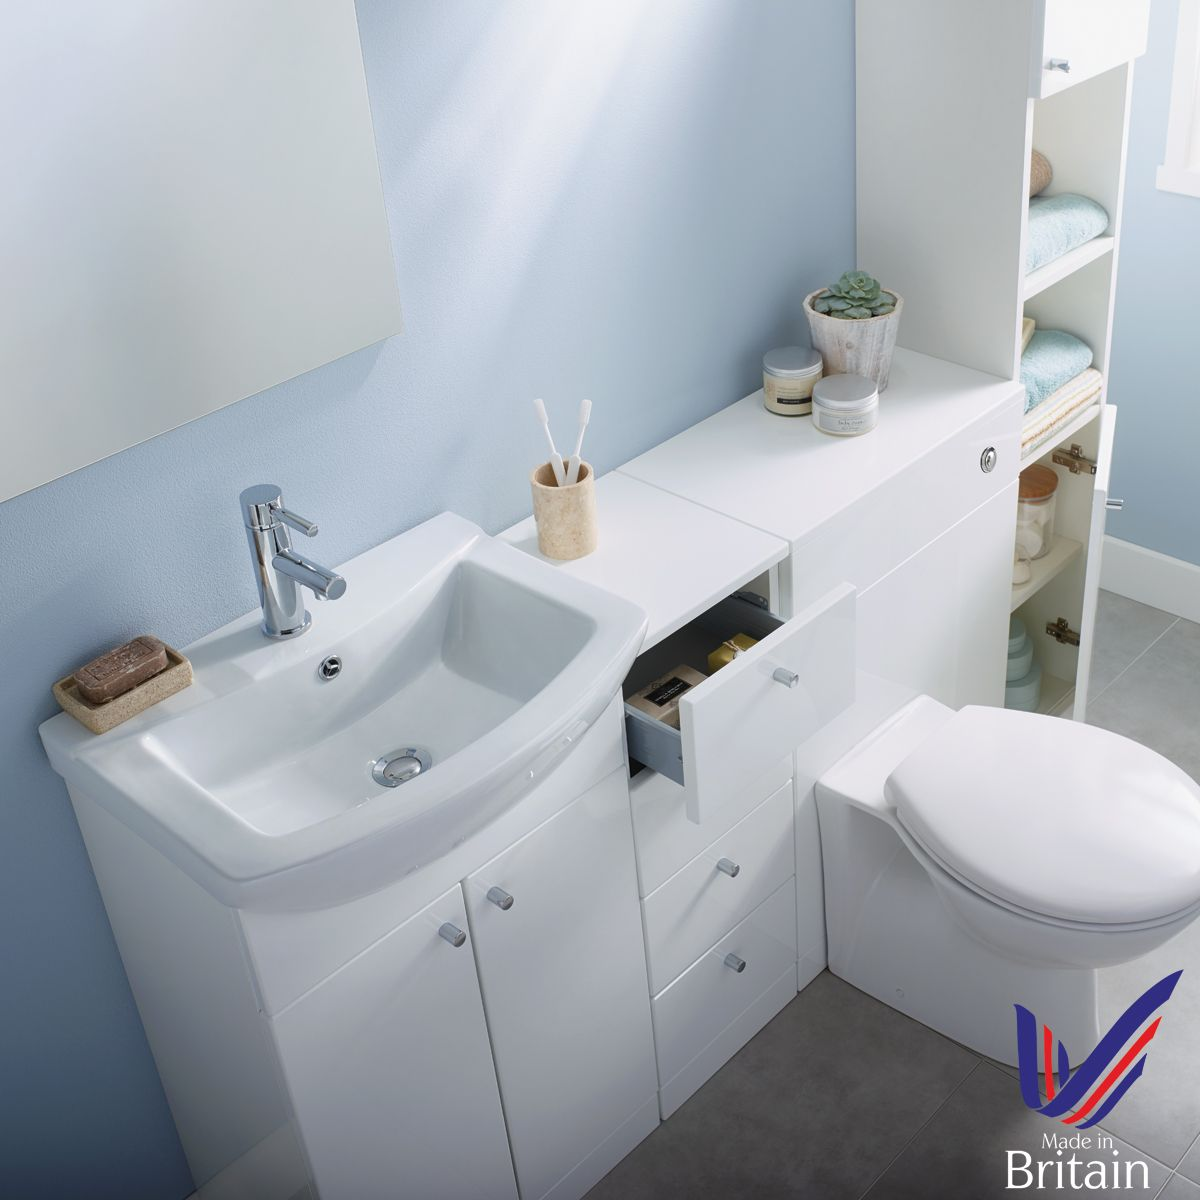 Ikoma White Gloss Vanity Unit with Basin 650mm Overhead